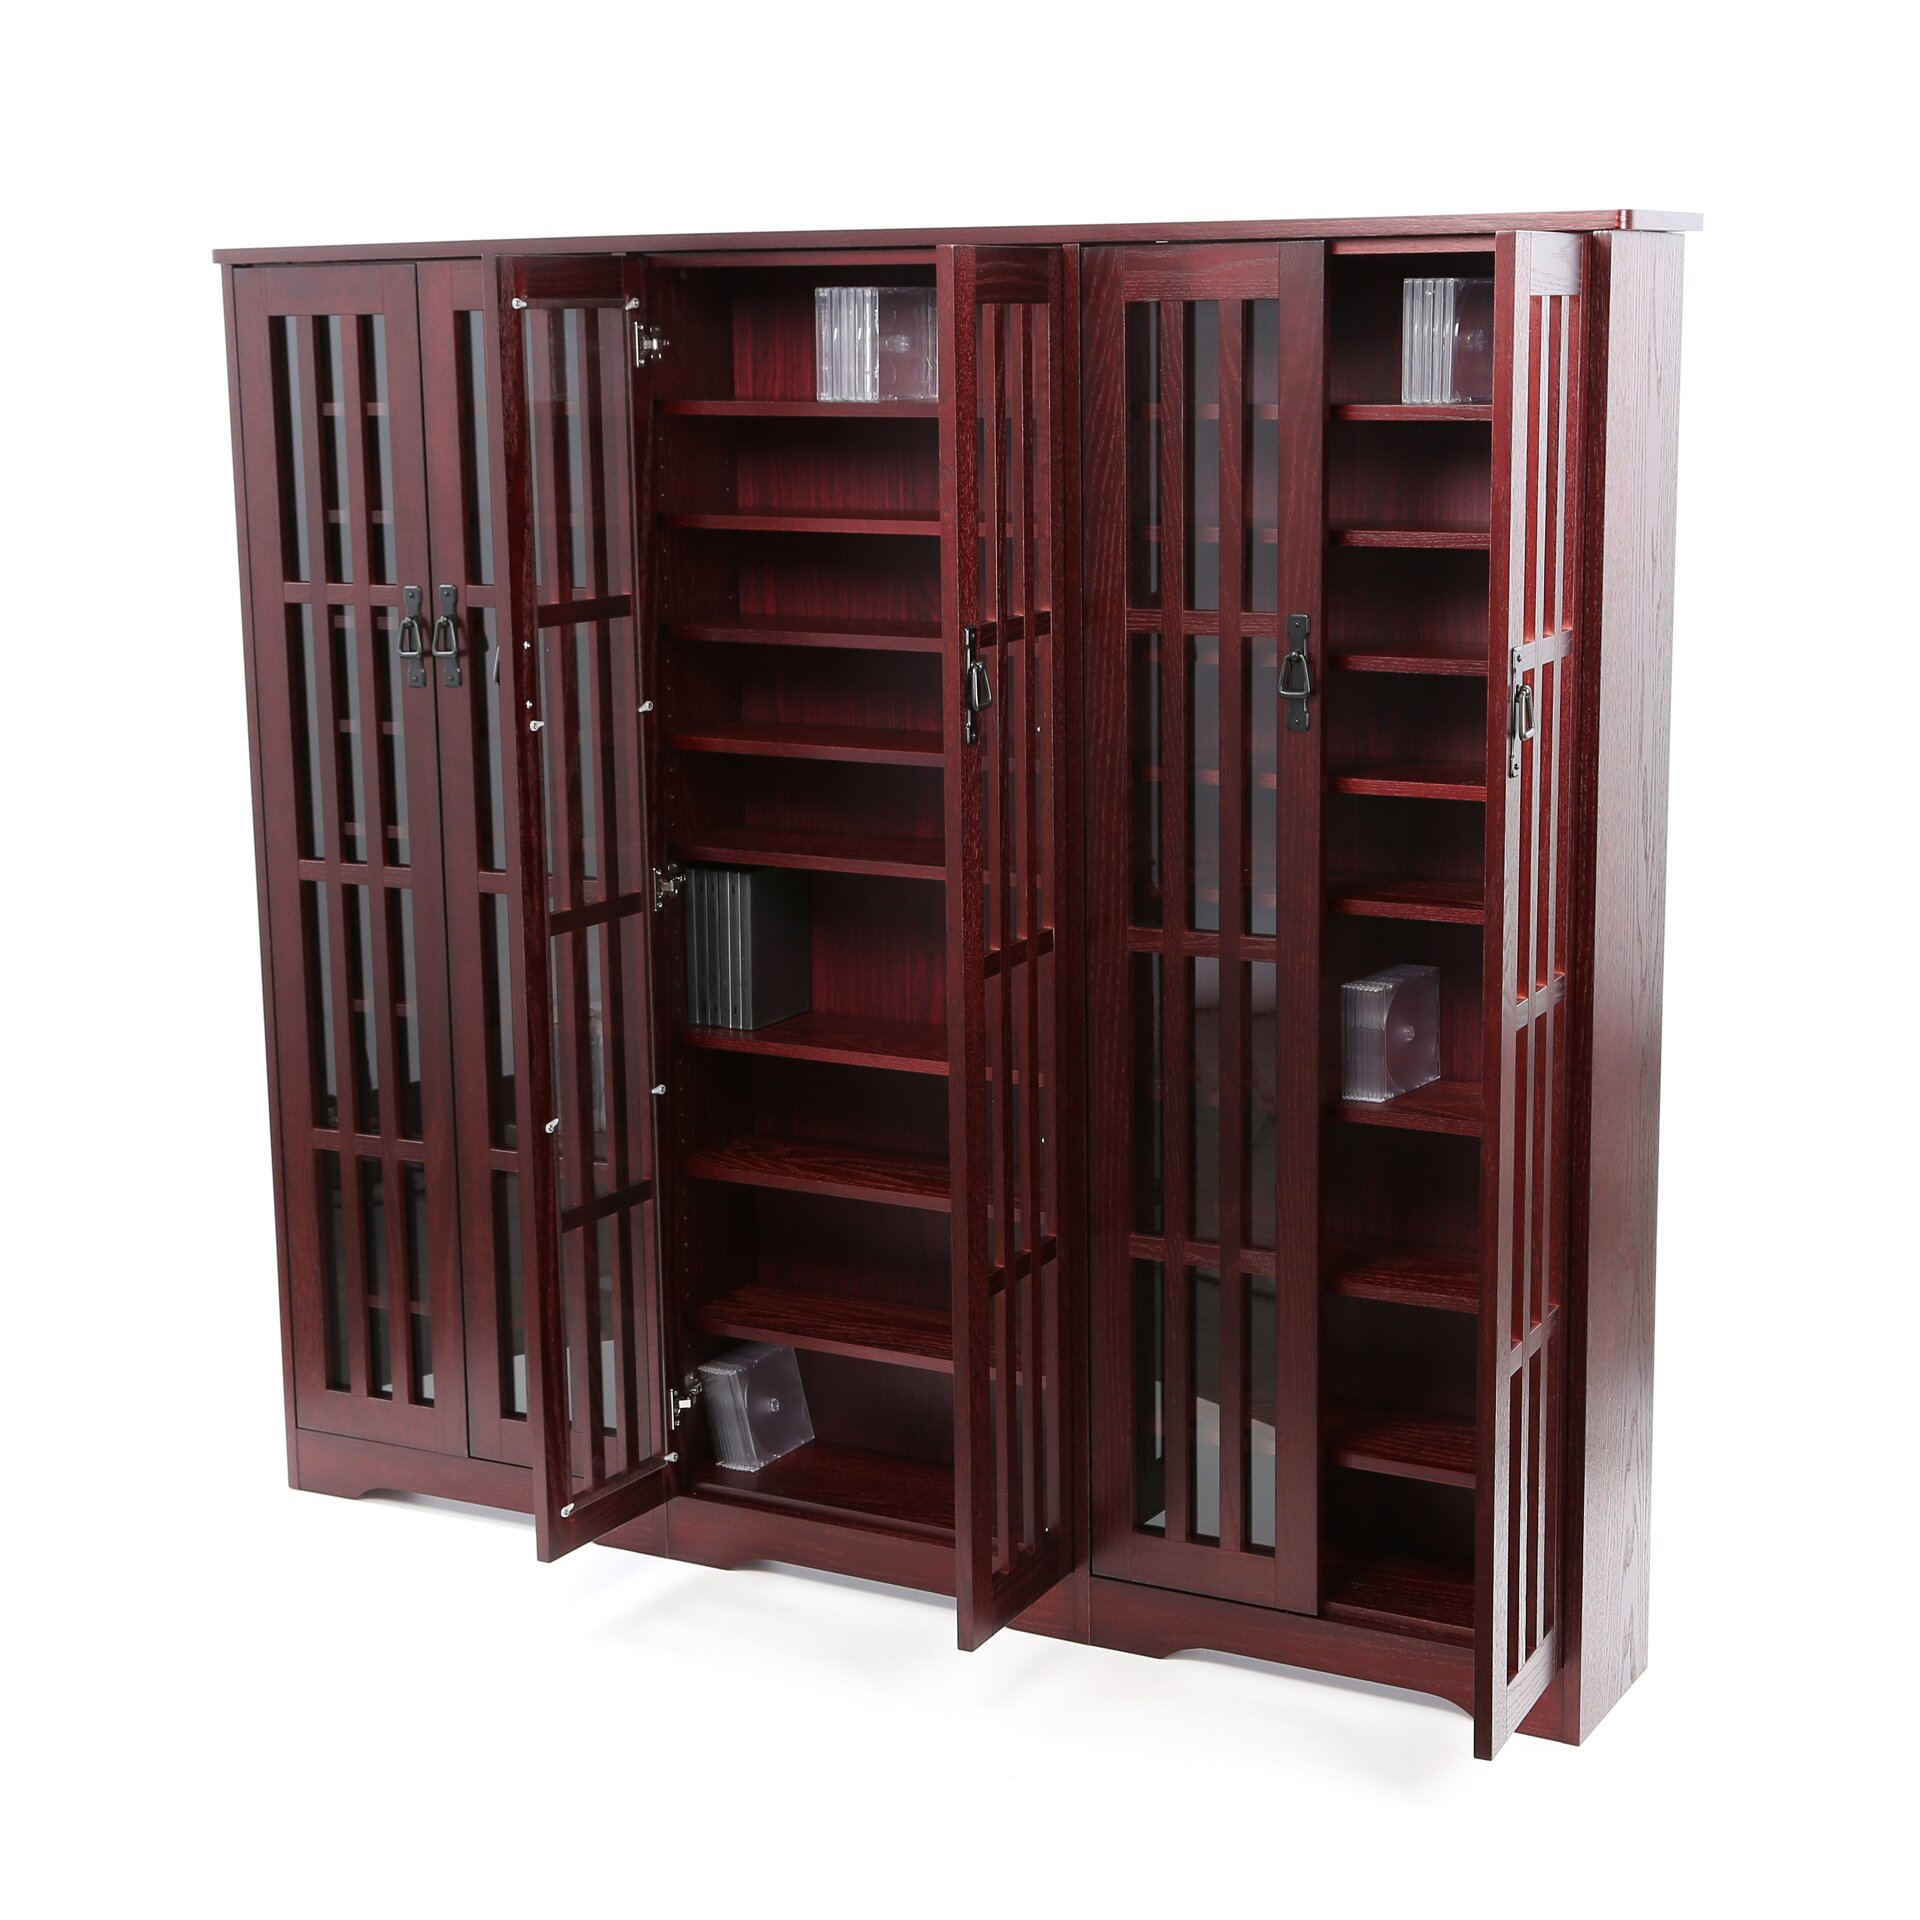 andover mills jones multimedia cabinet reviews. Black Bedroom Furniture Sets. Home Design Ideas